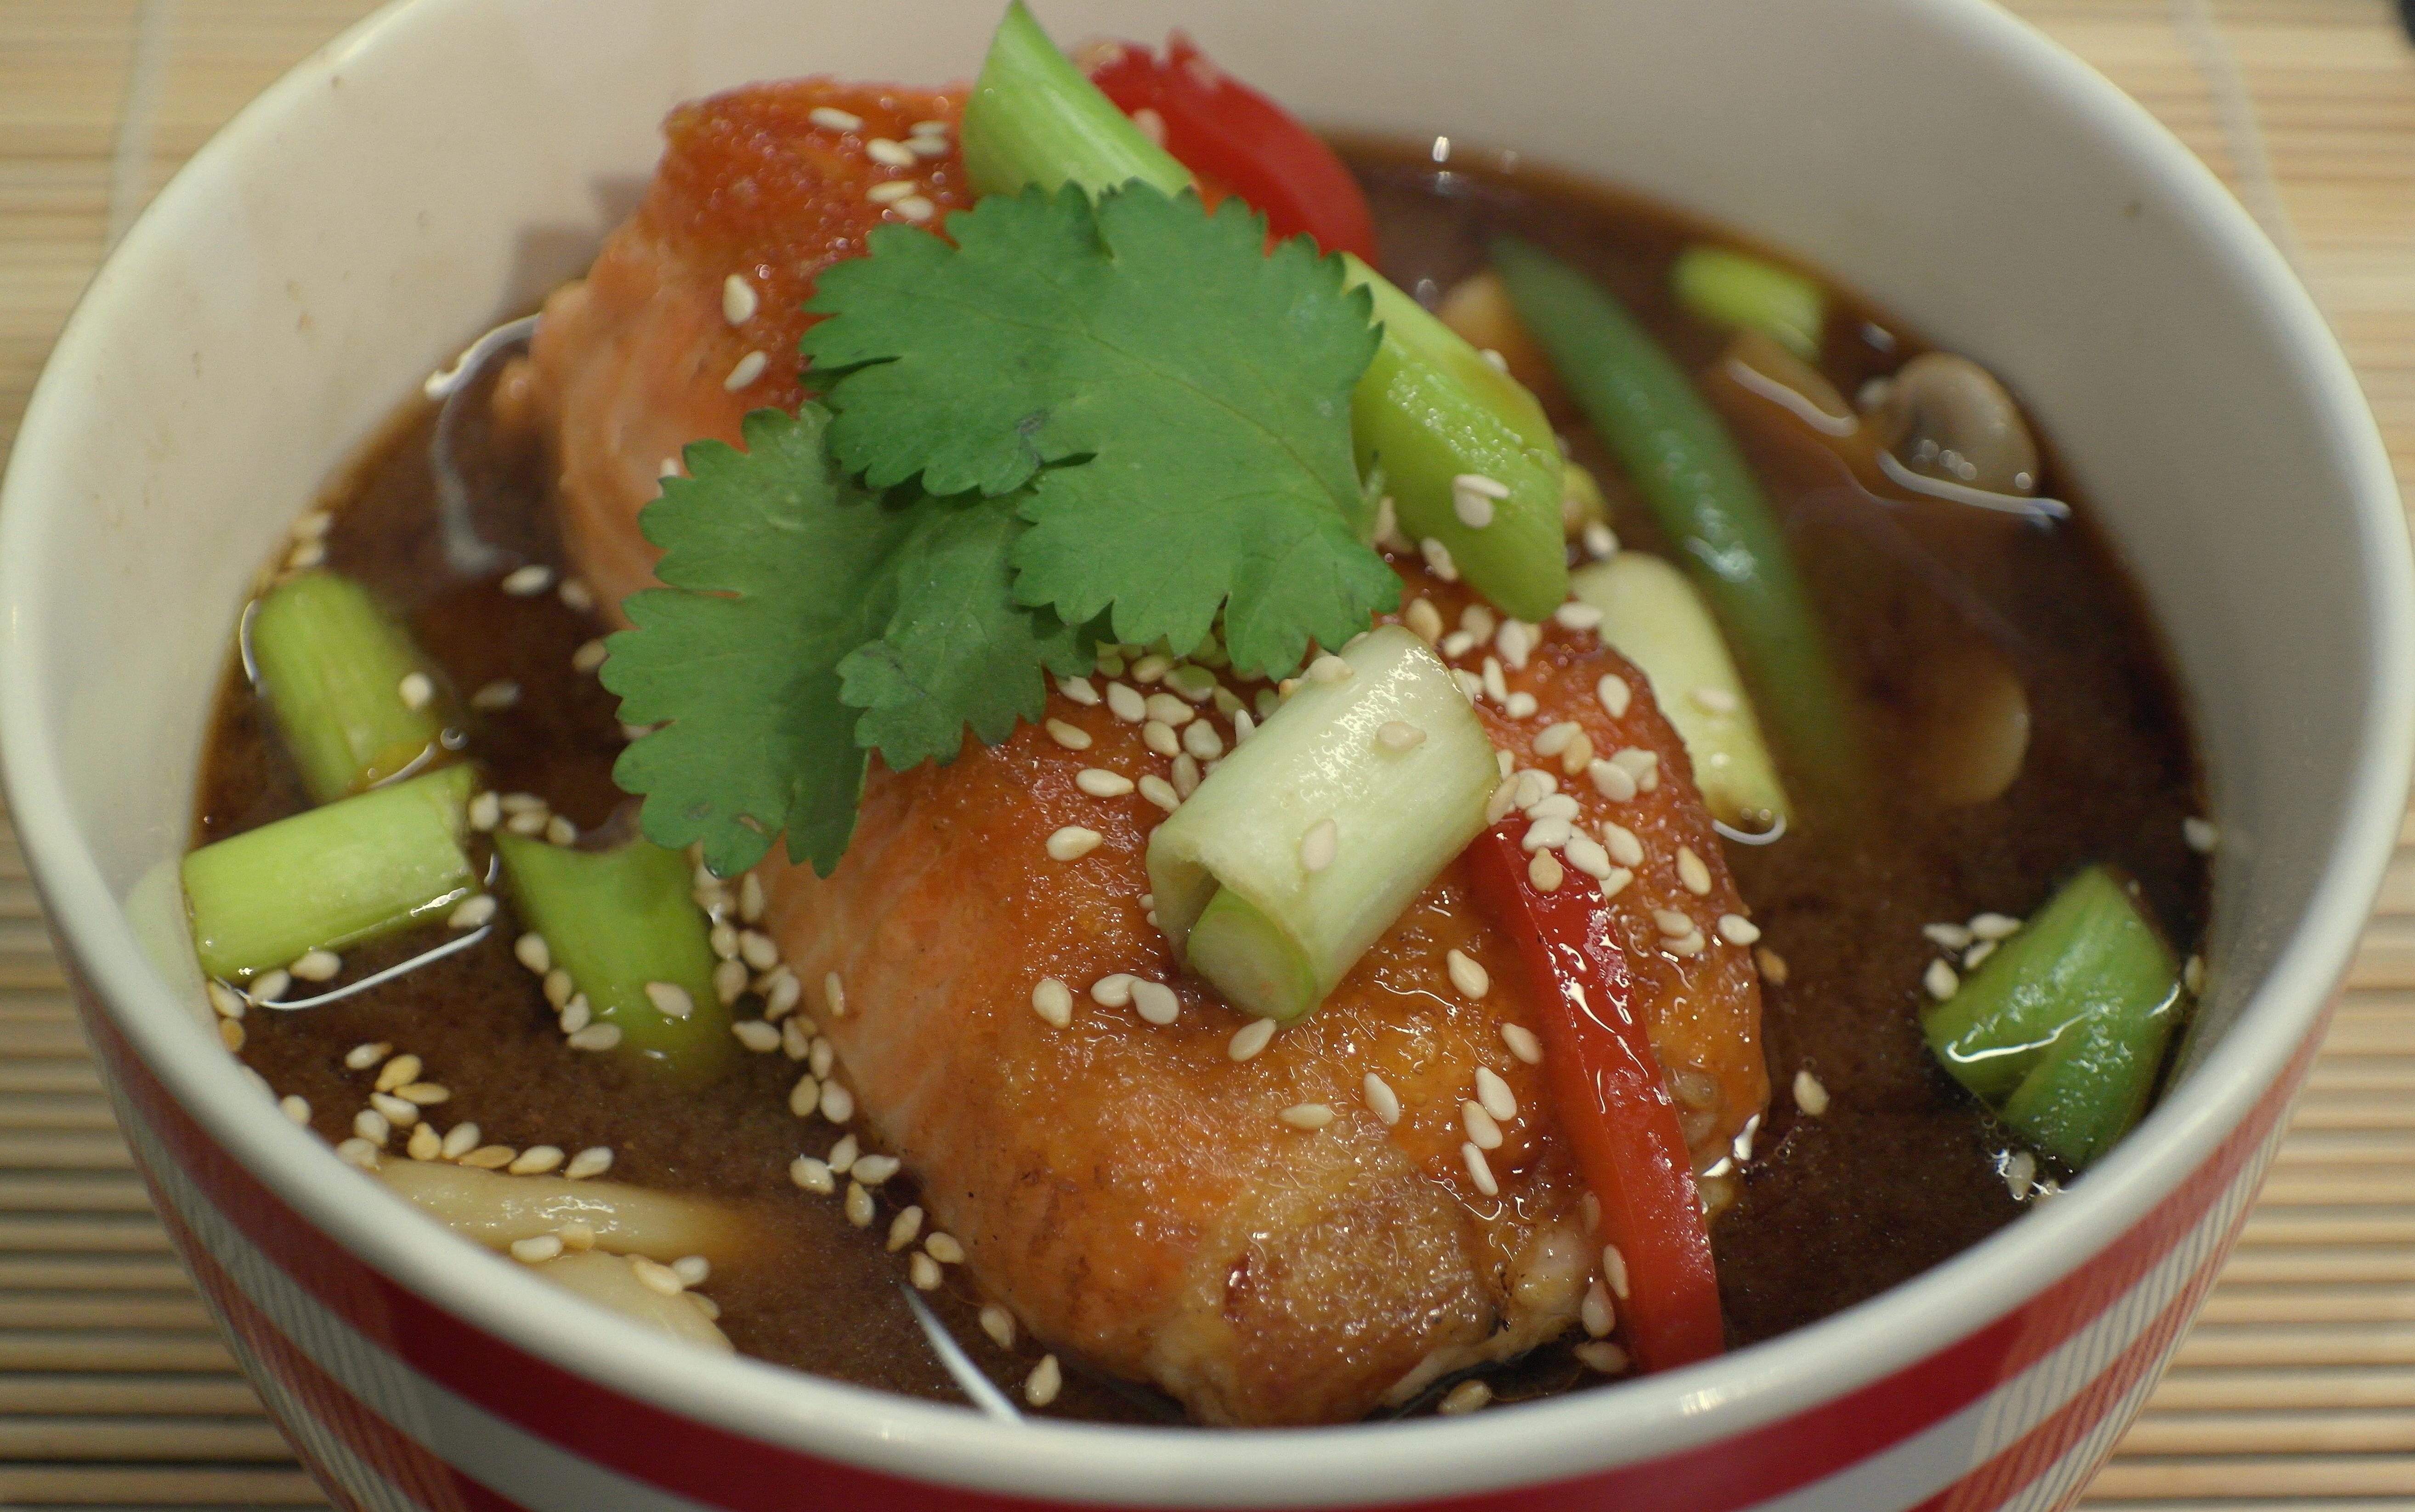 Ramen Noodle Soup with Crispy Salmon - The Beauty Foodie